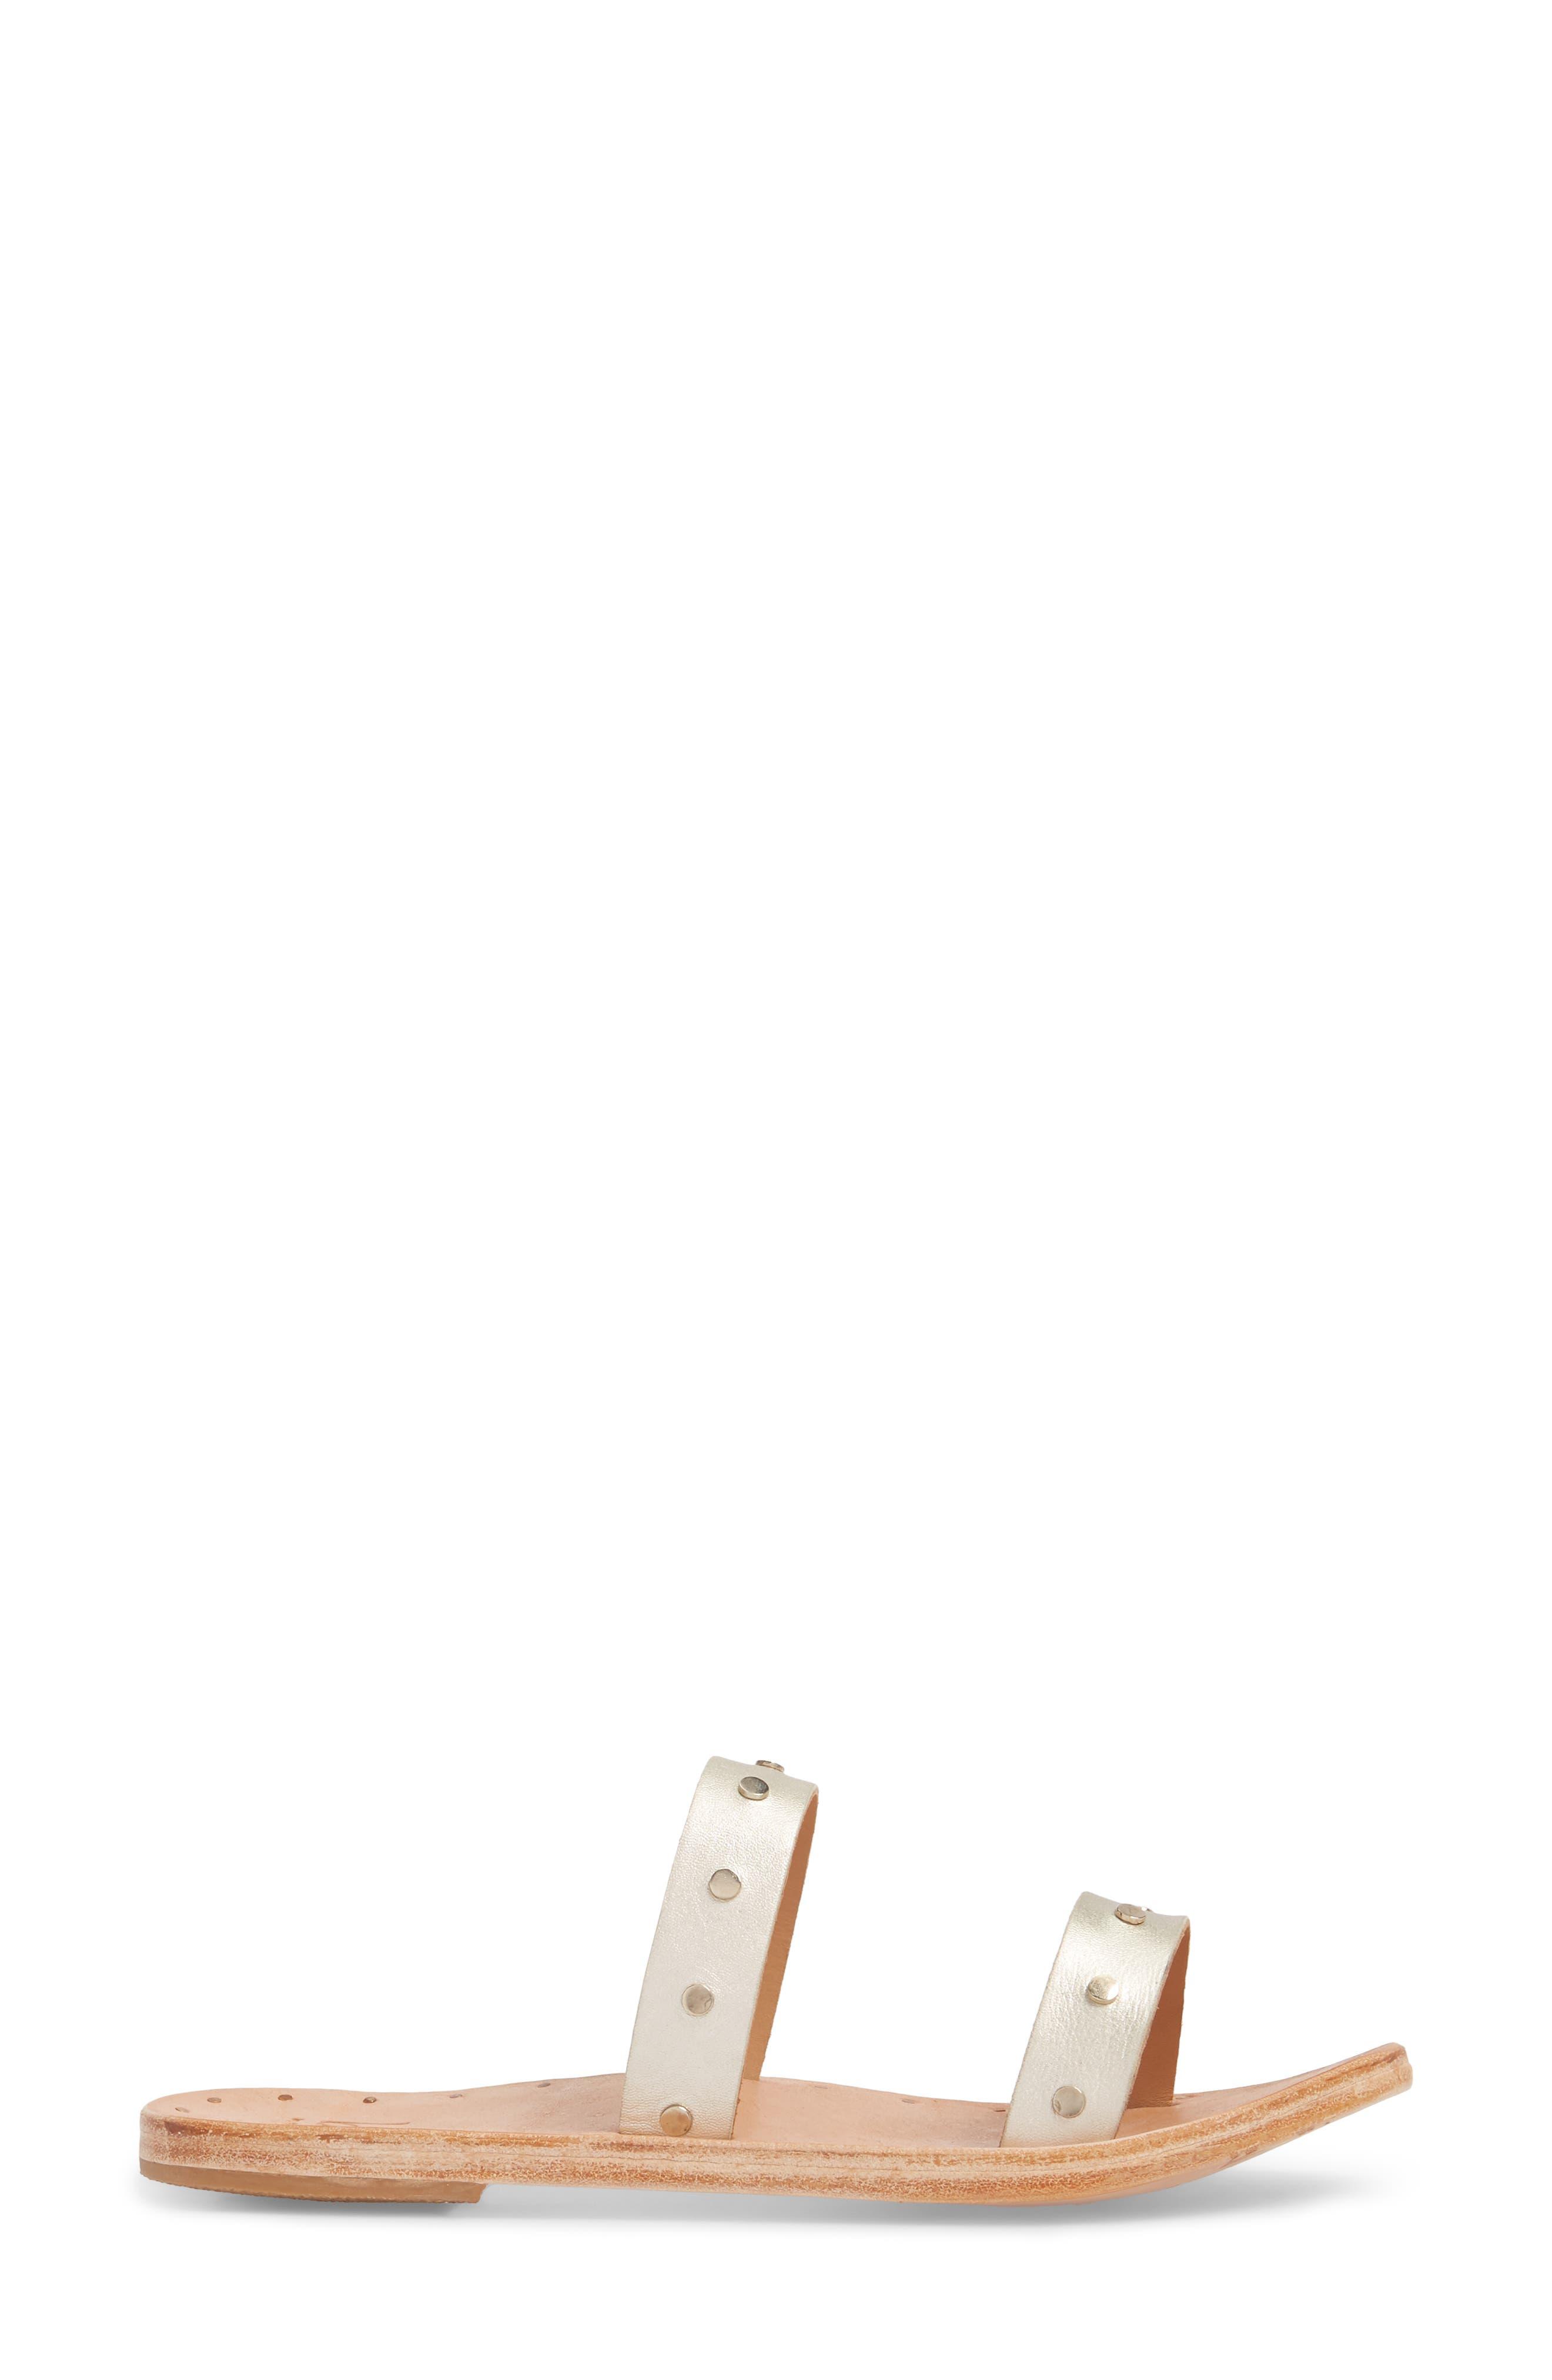 Woodpecker Studded Slide Sandal,                             Alternate thumbnail 3, color,                             Platinum Gold/ Nat